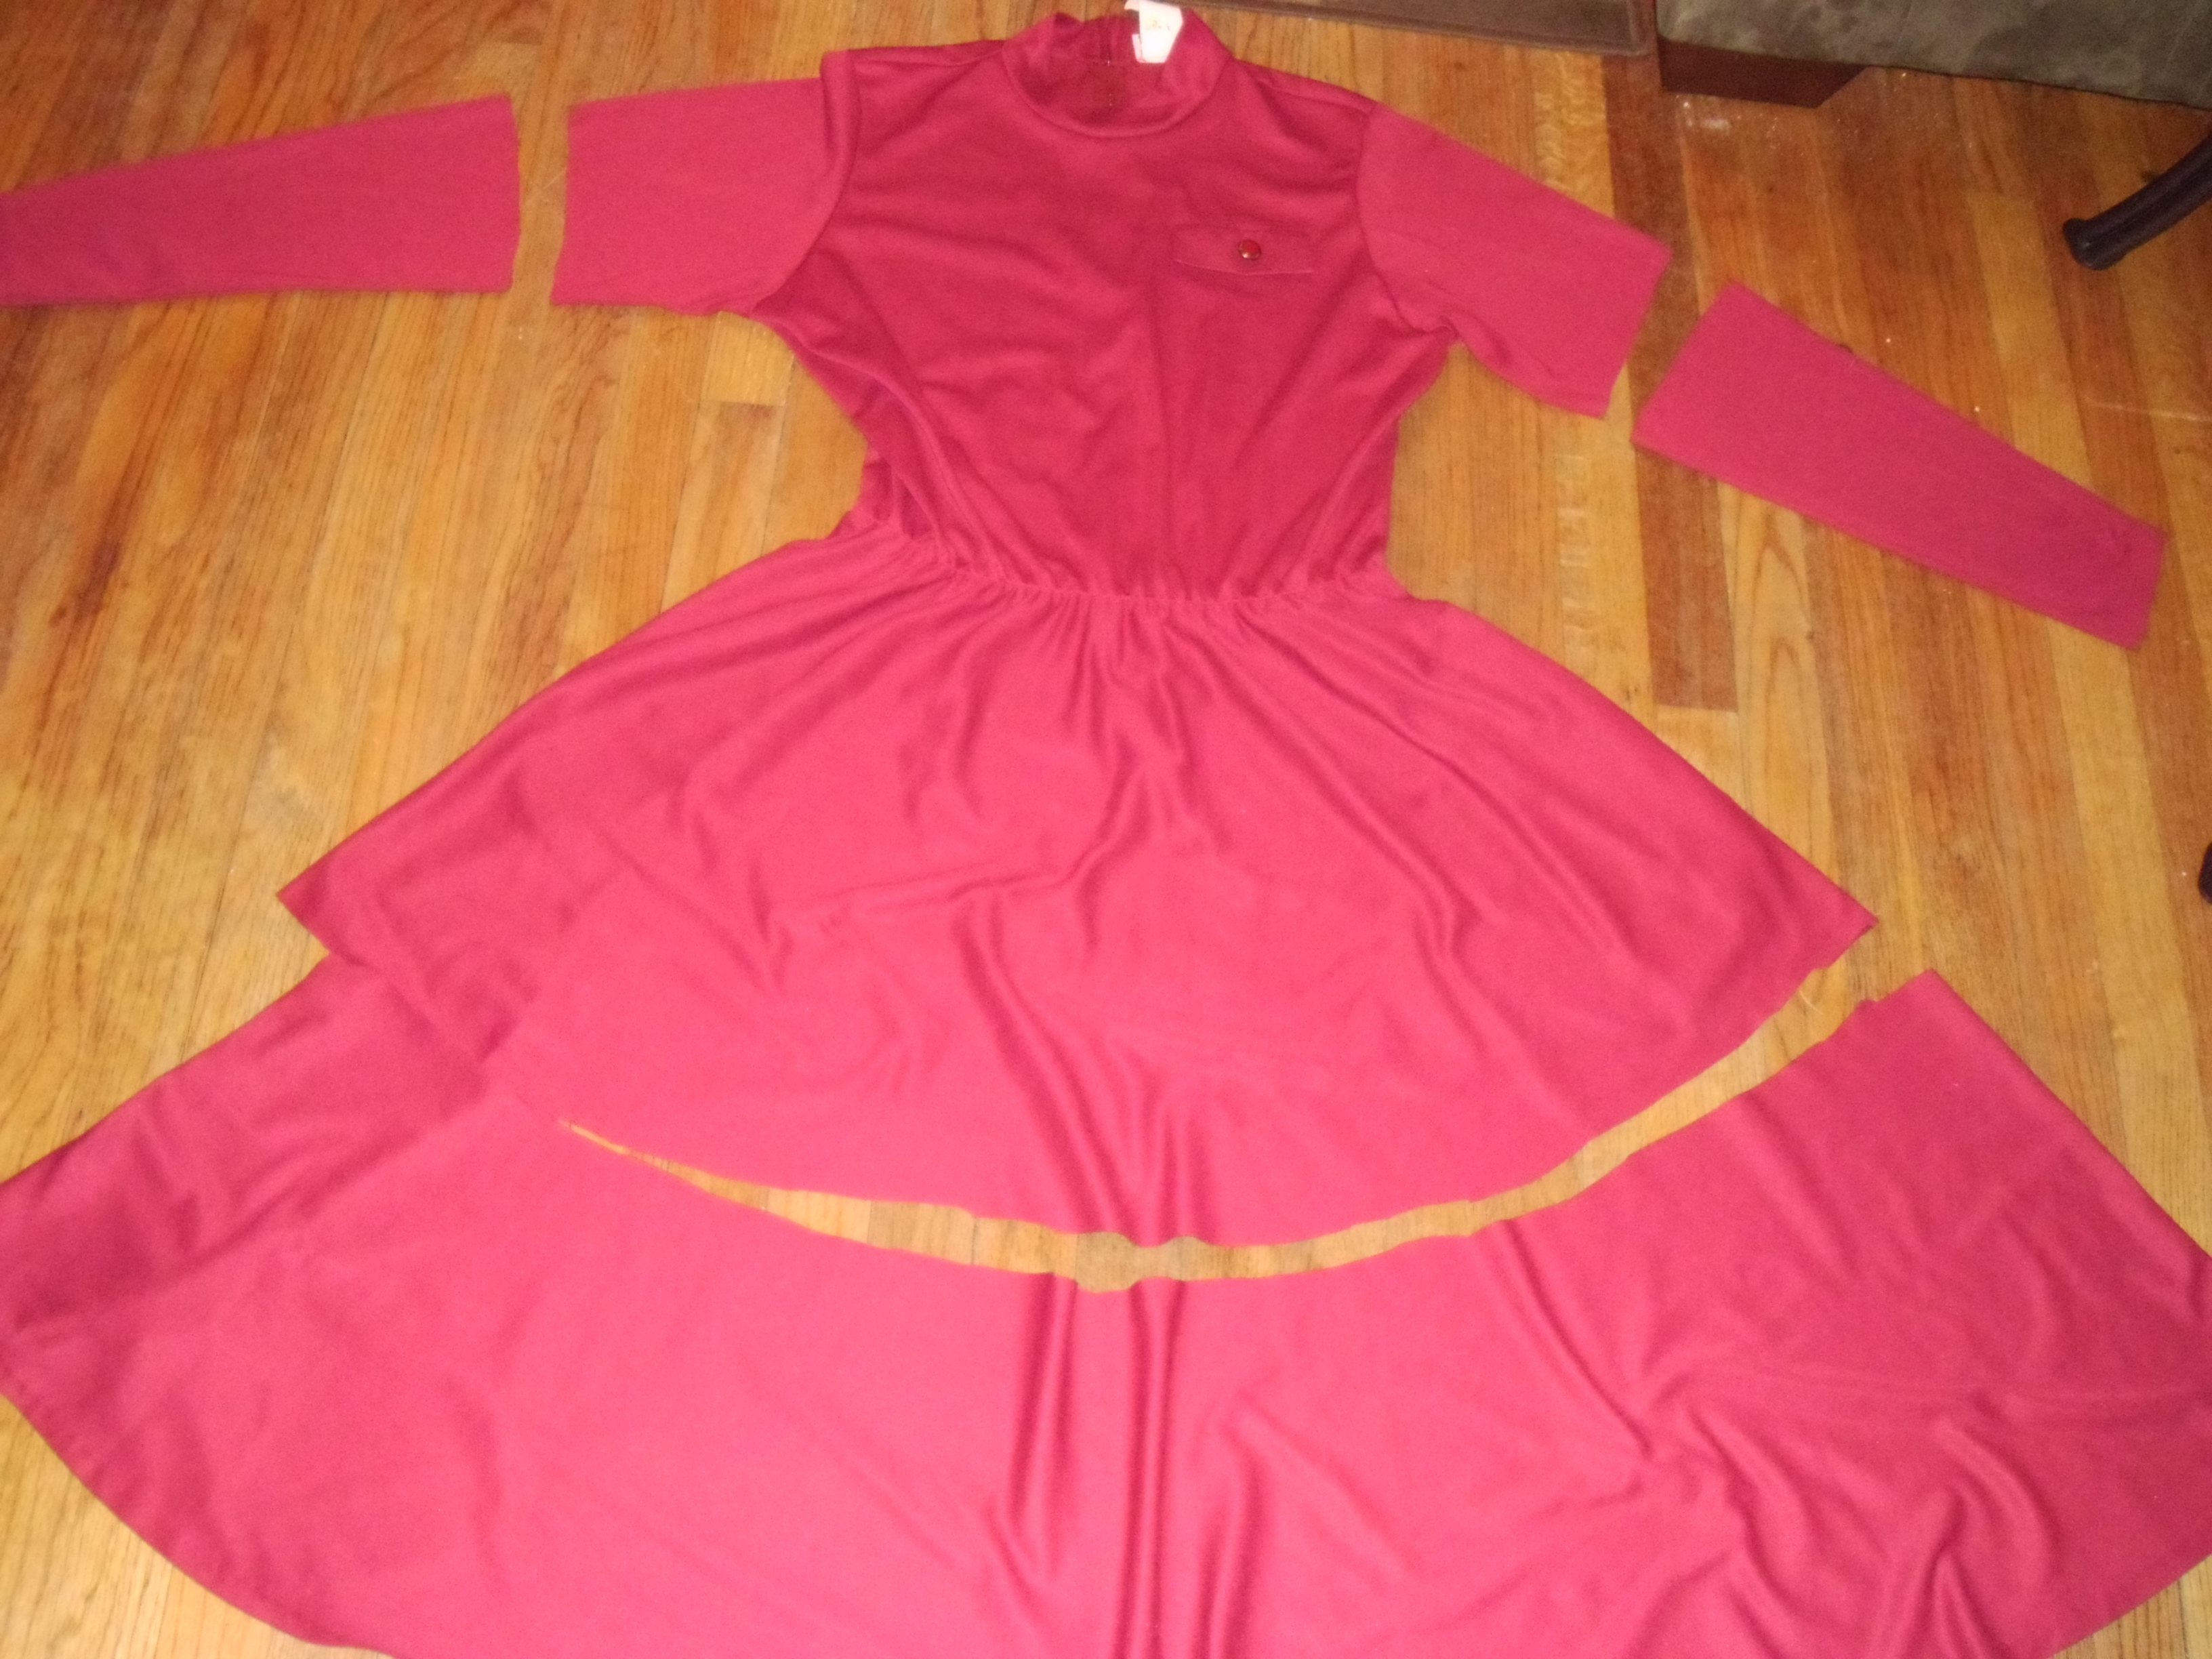 Day 177: Cranberry Sauce Dress 4